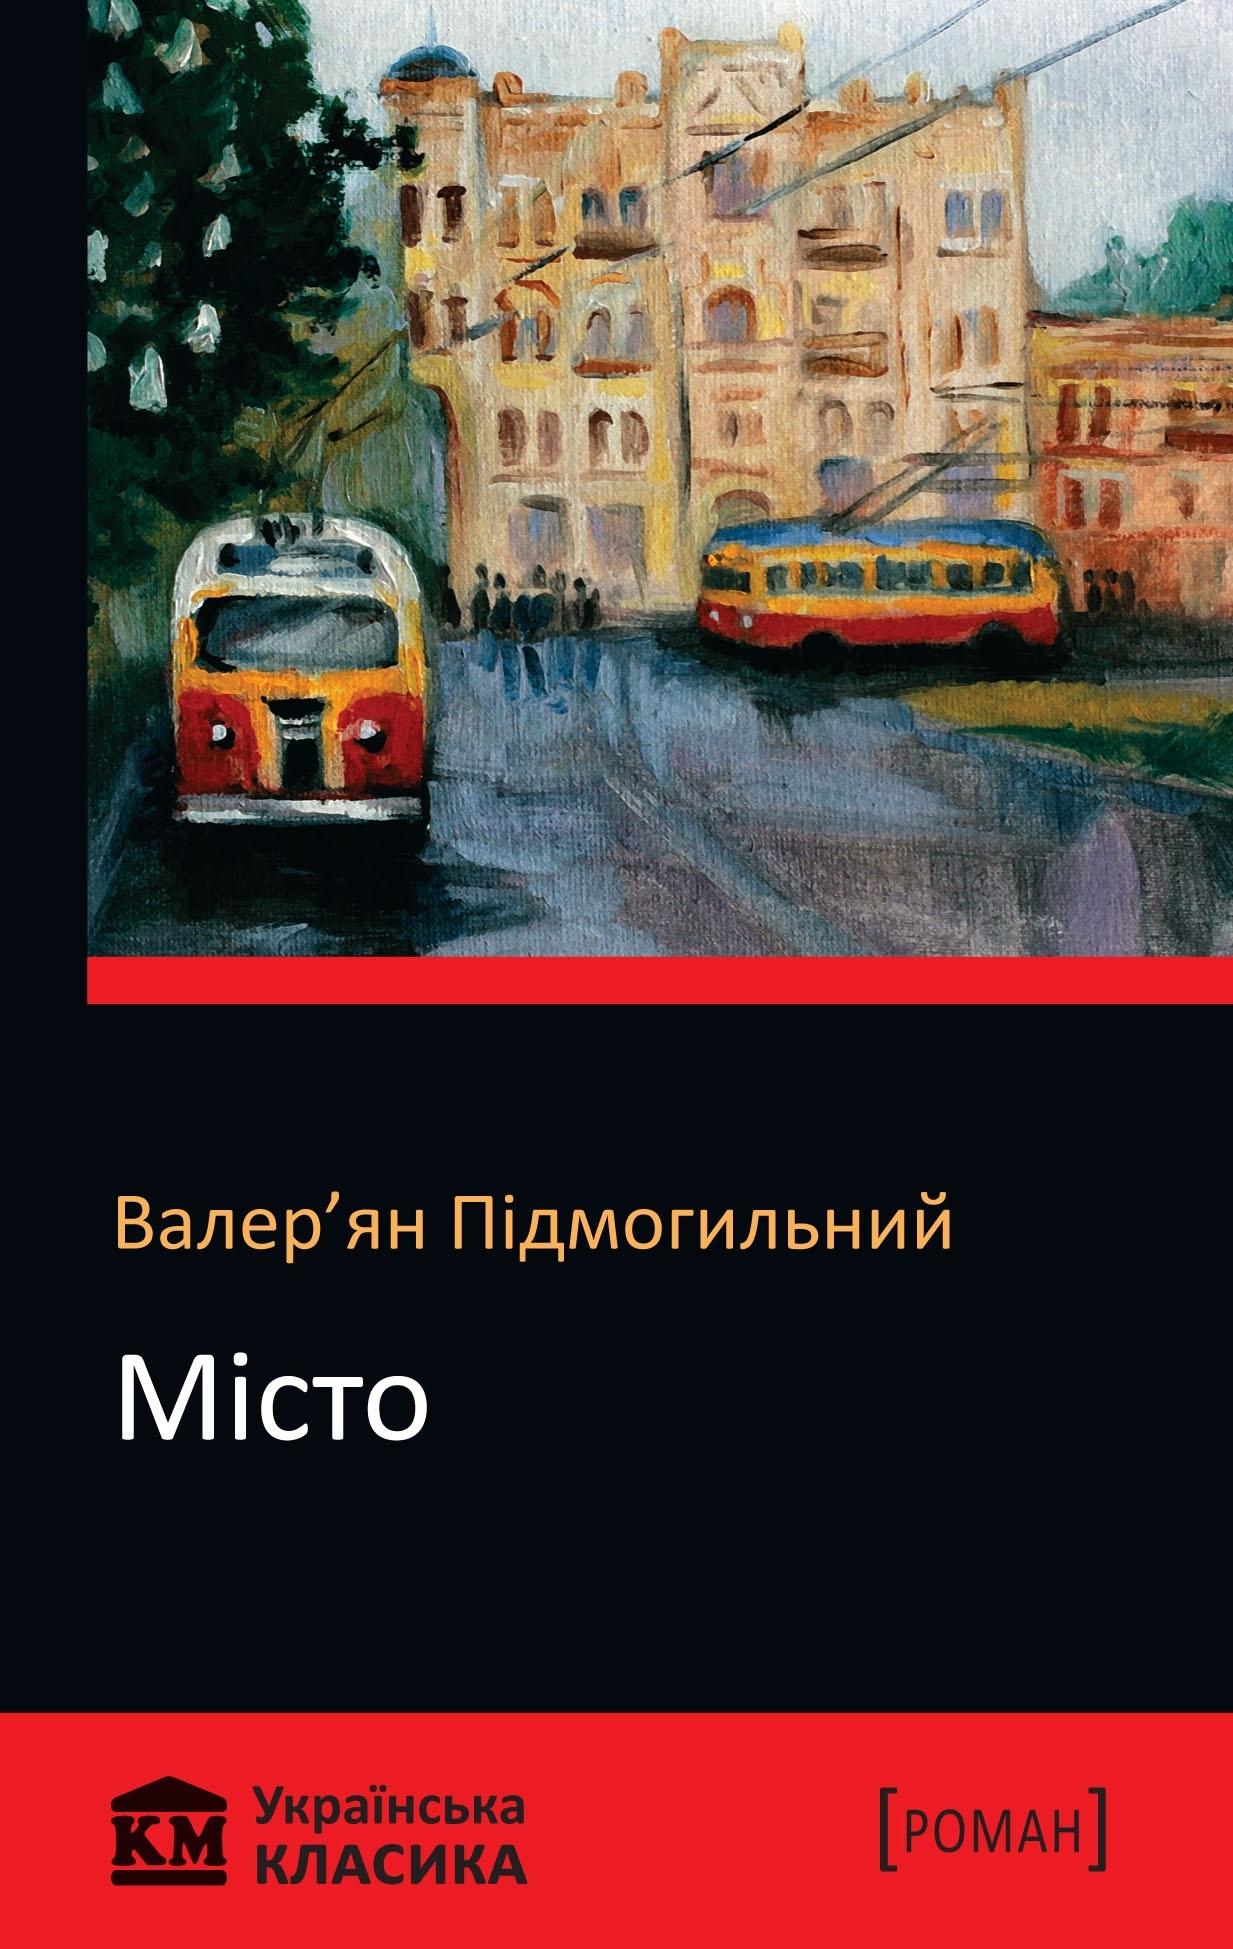 Отзывы о книге Місто 7a513b4b8a78d